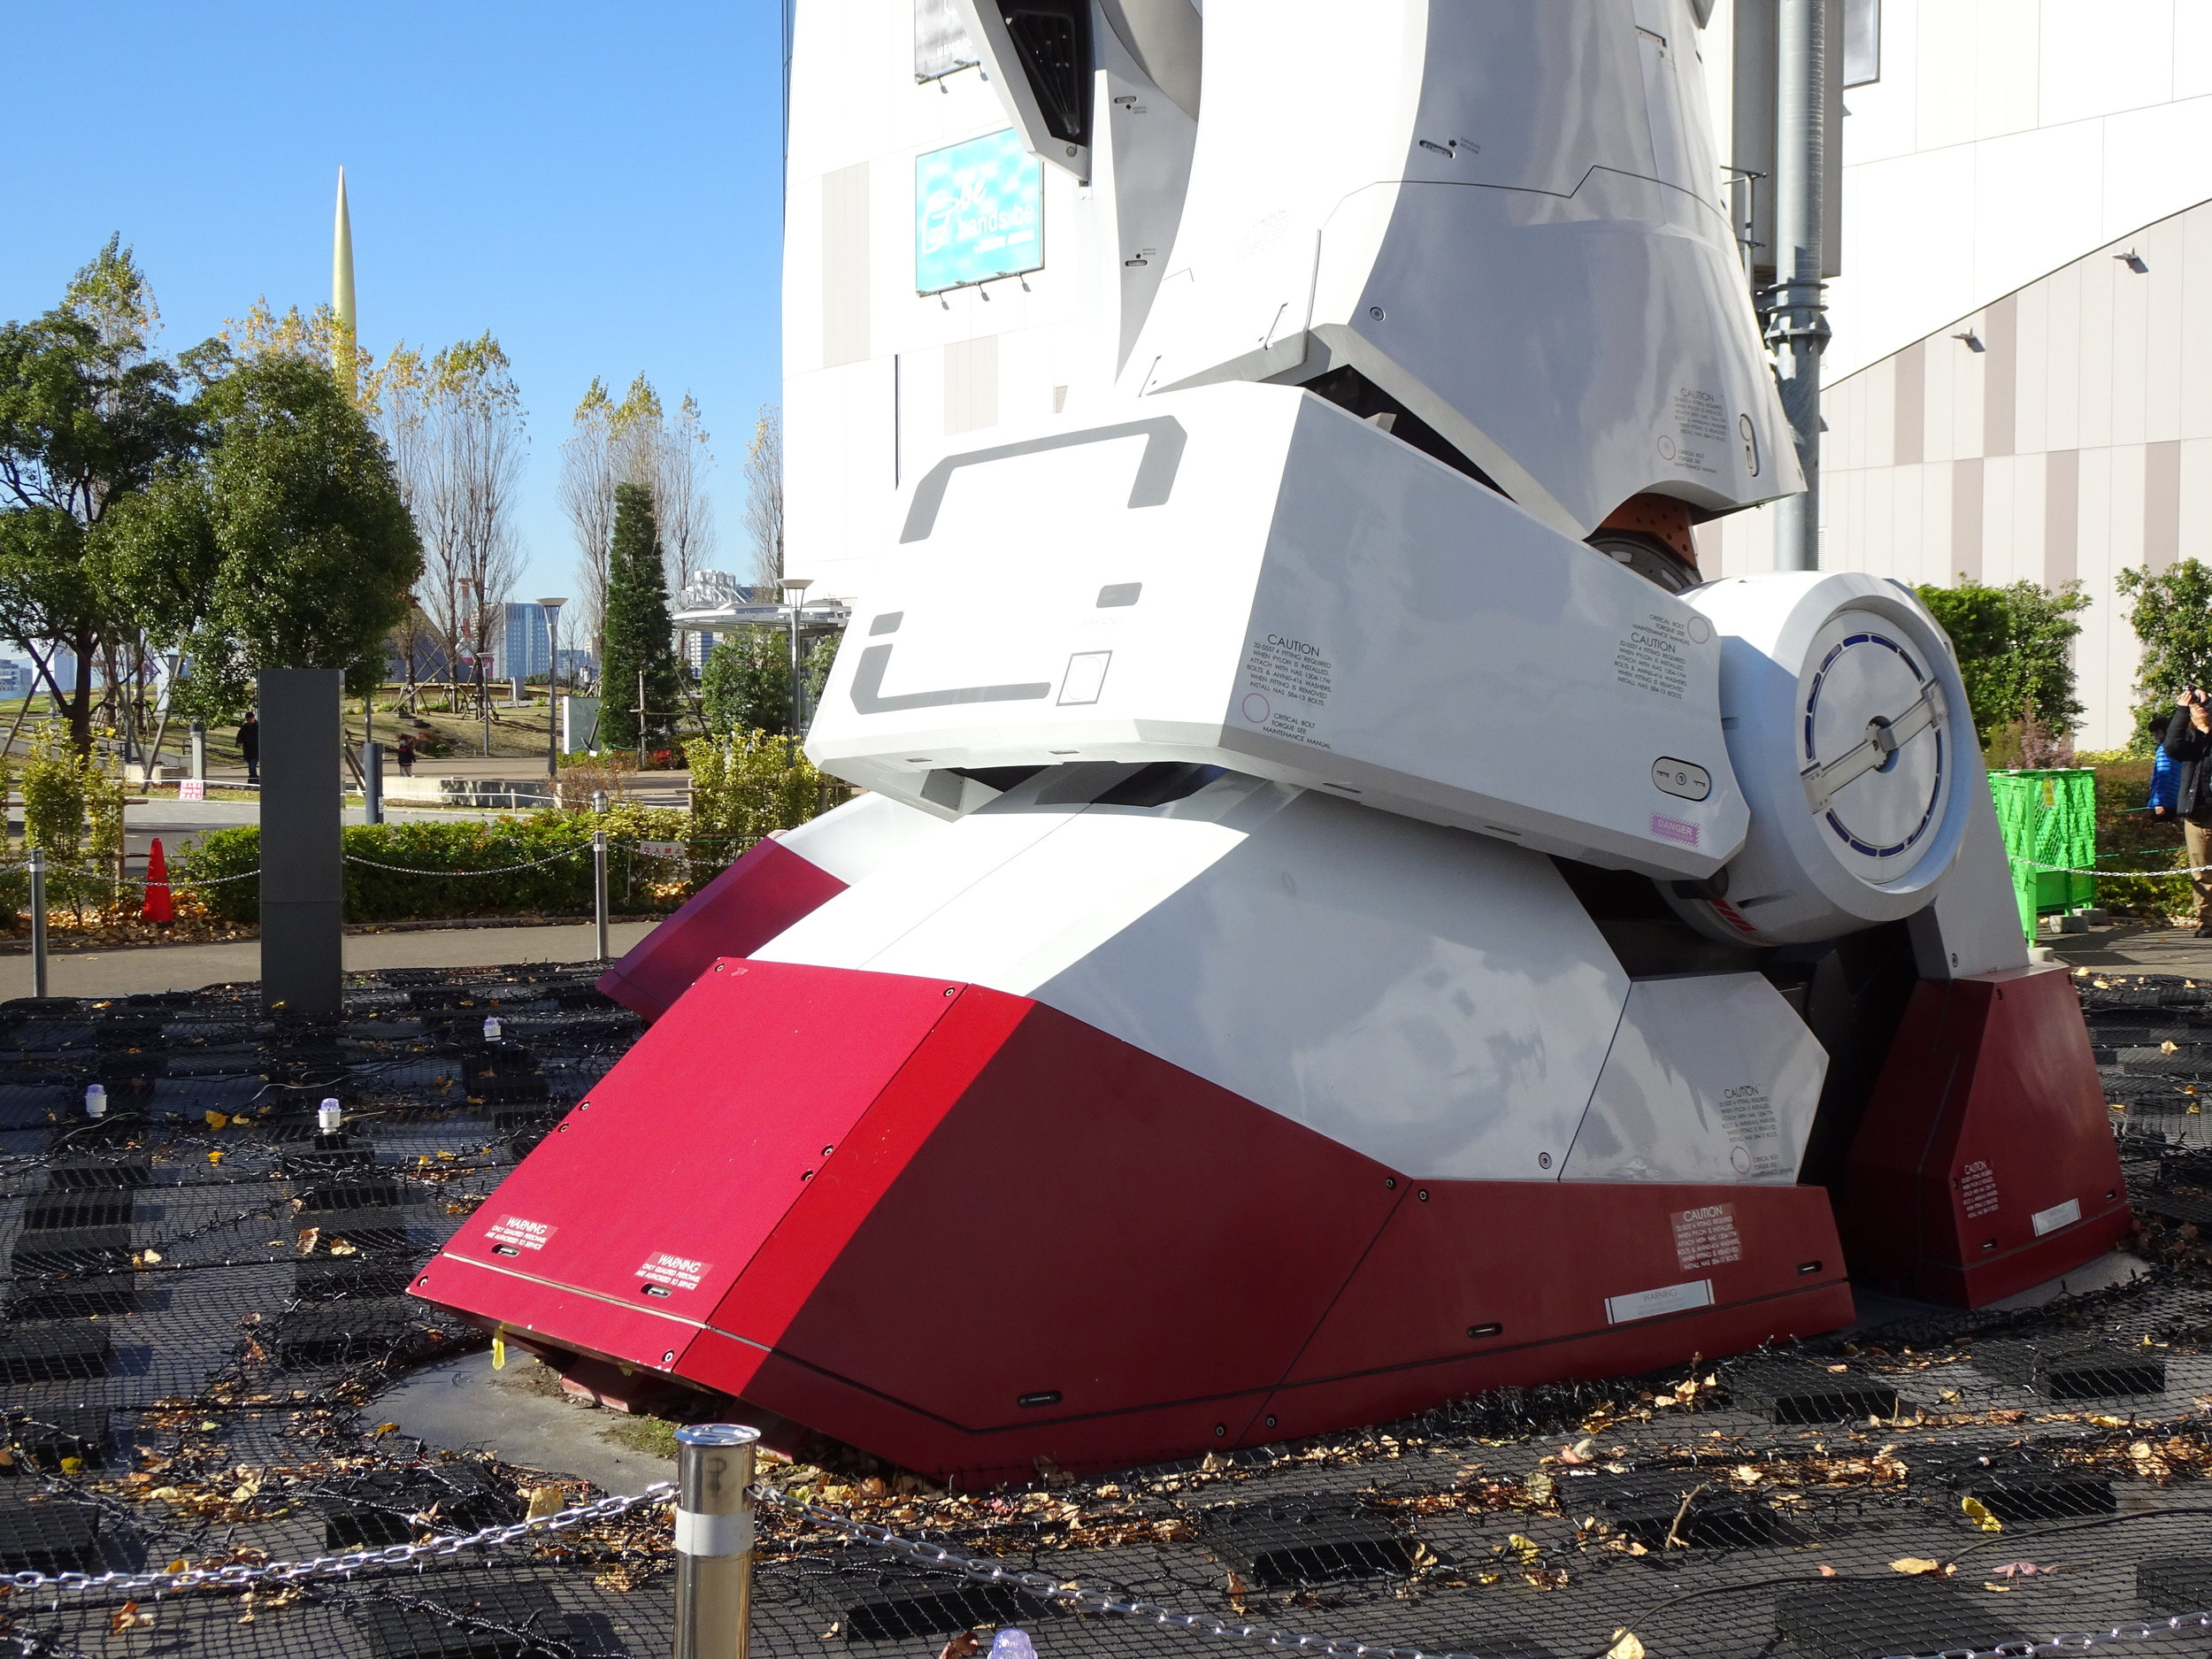 RX-78-2 Gundam 1-1 Statue - 066.jpg